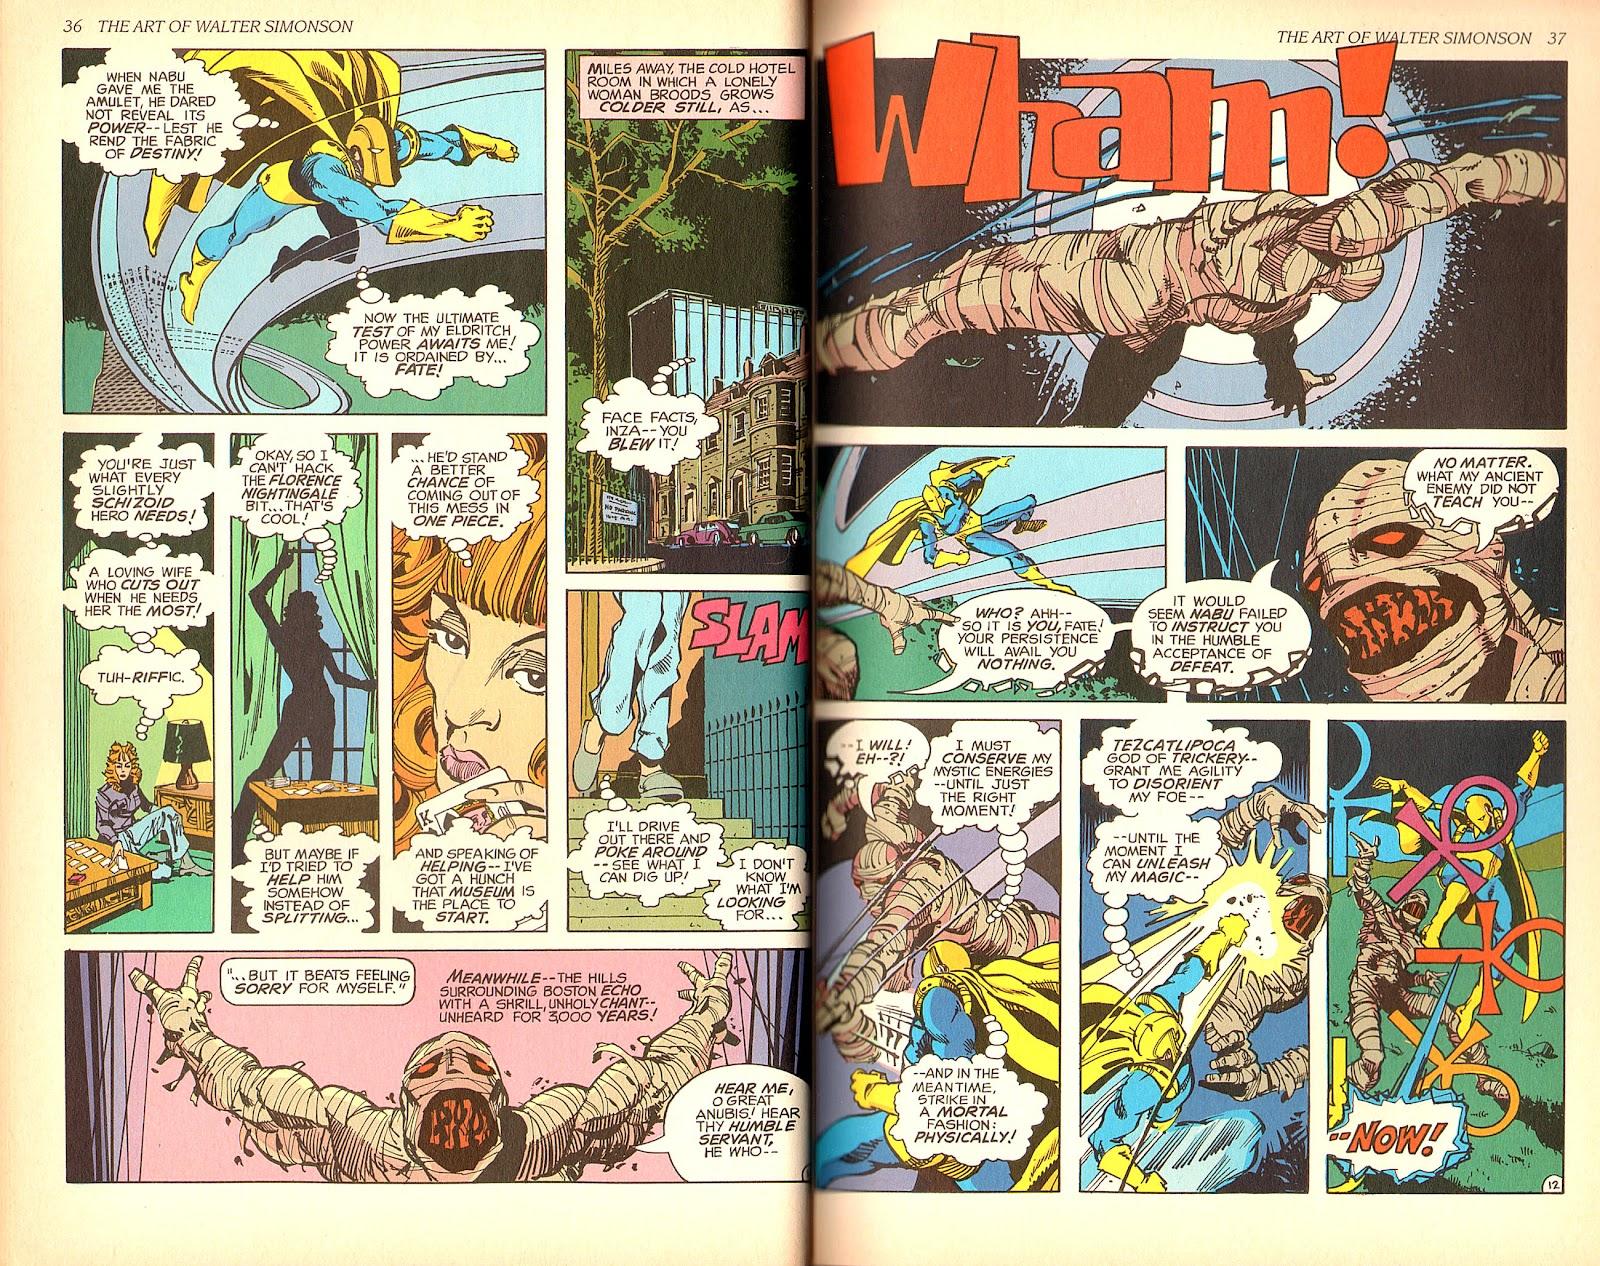 Read online The Art of Walter Simonson comic -  Issue # TPB - 20